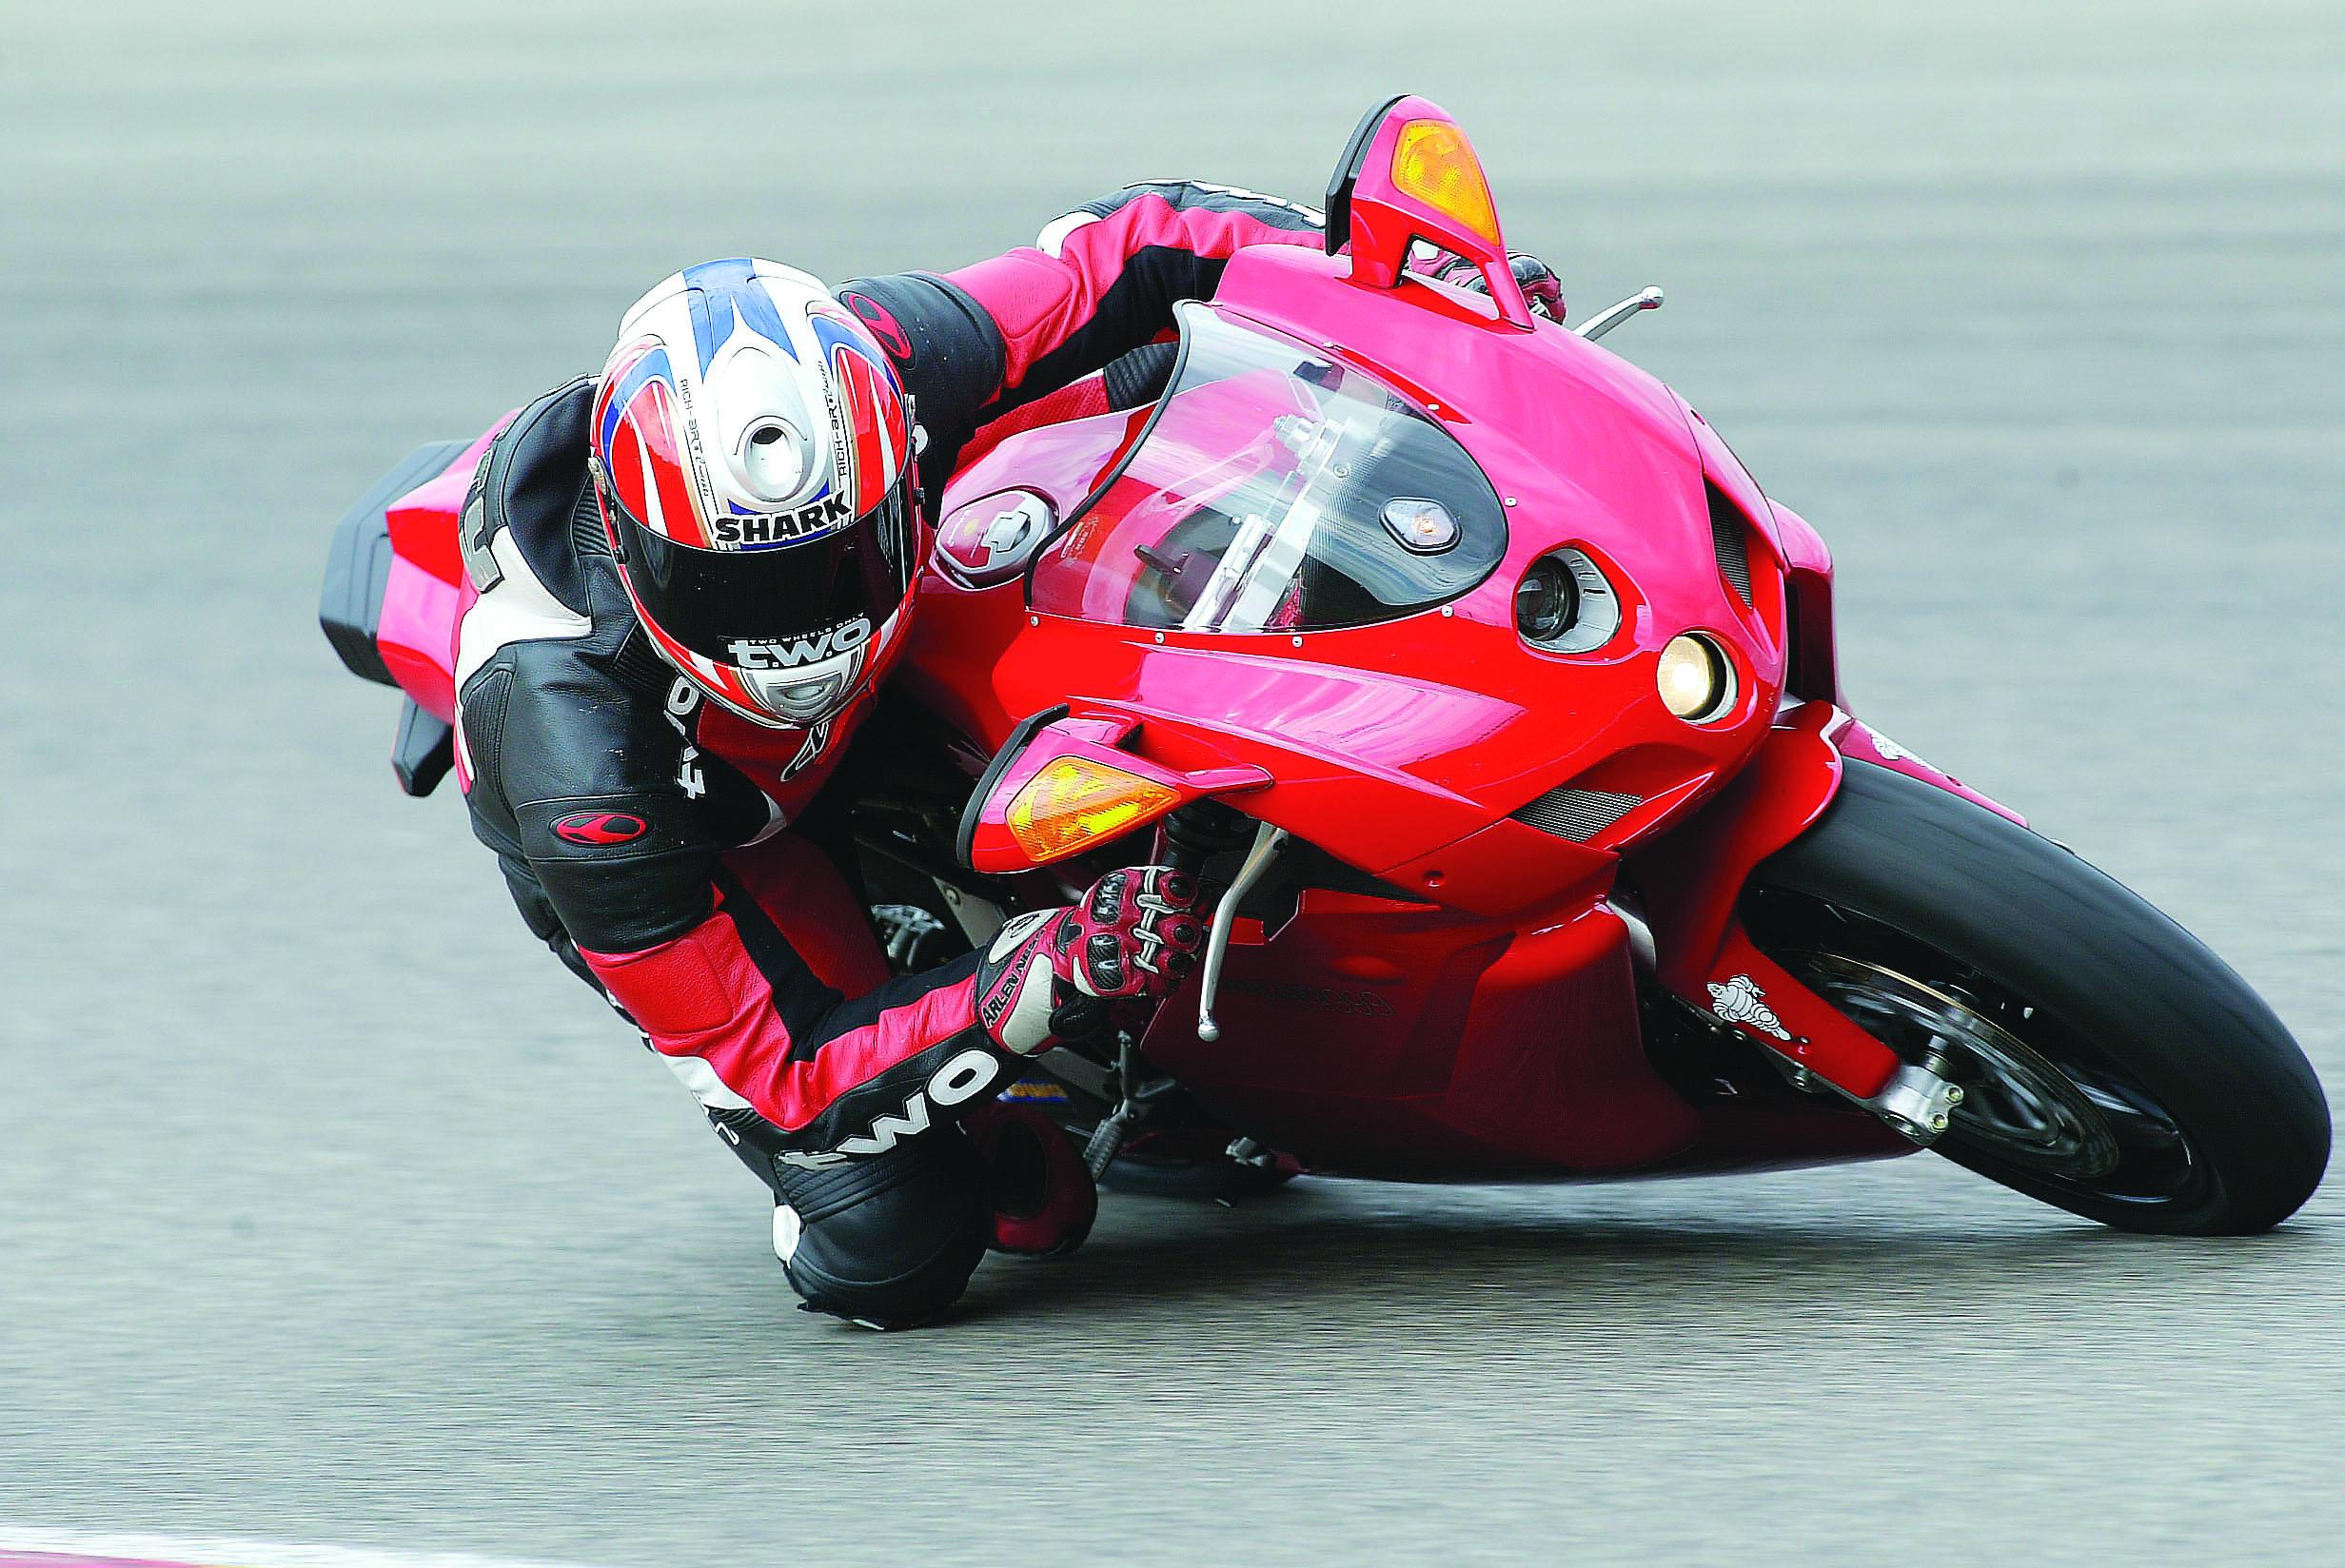 First Ride 2005 Ducati 999 Visordown